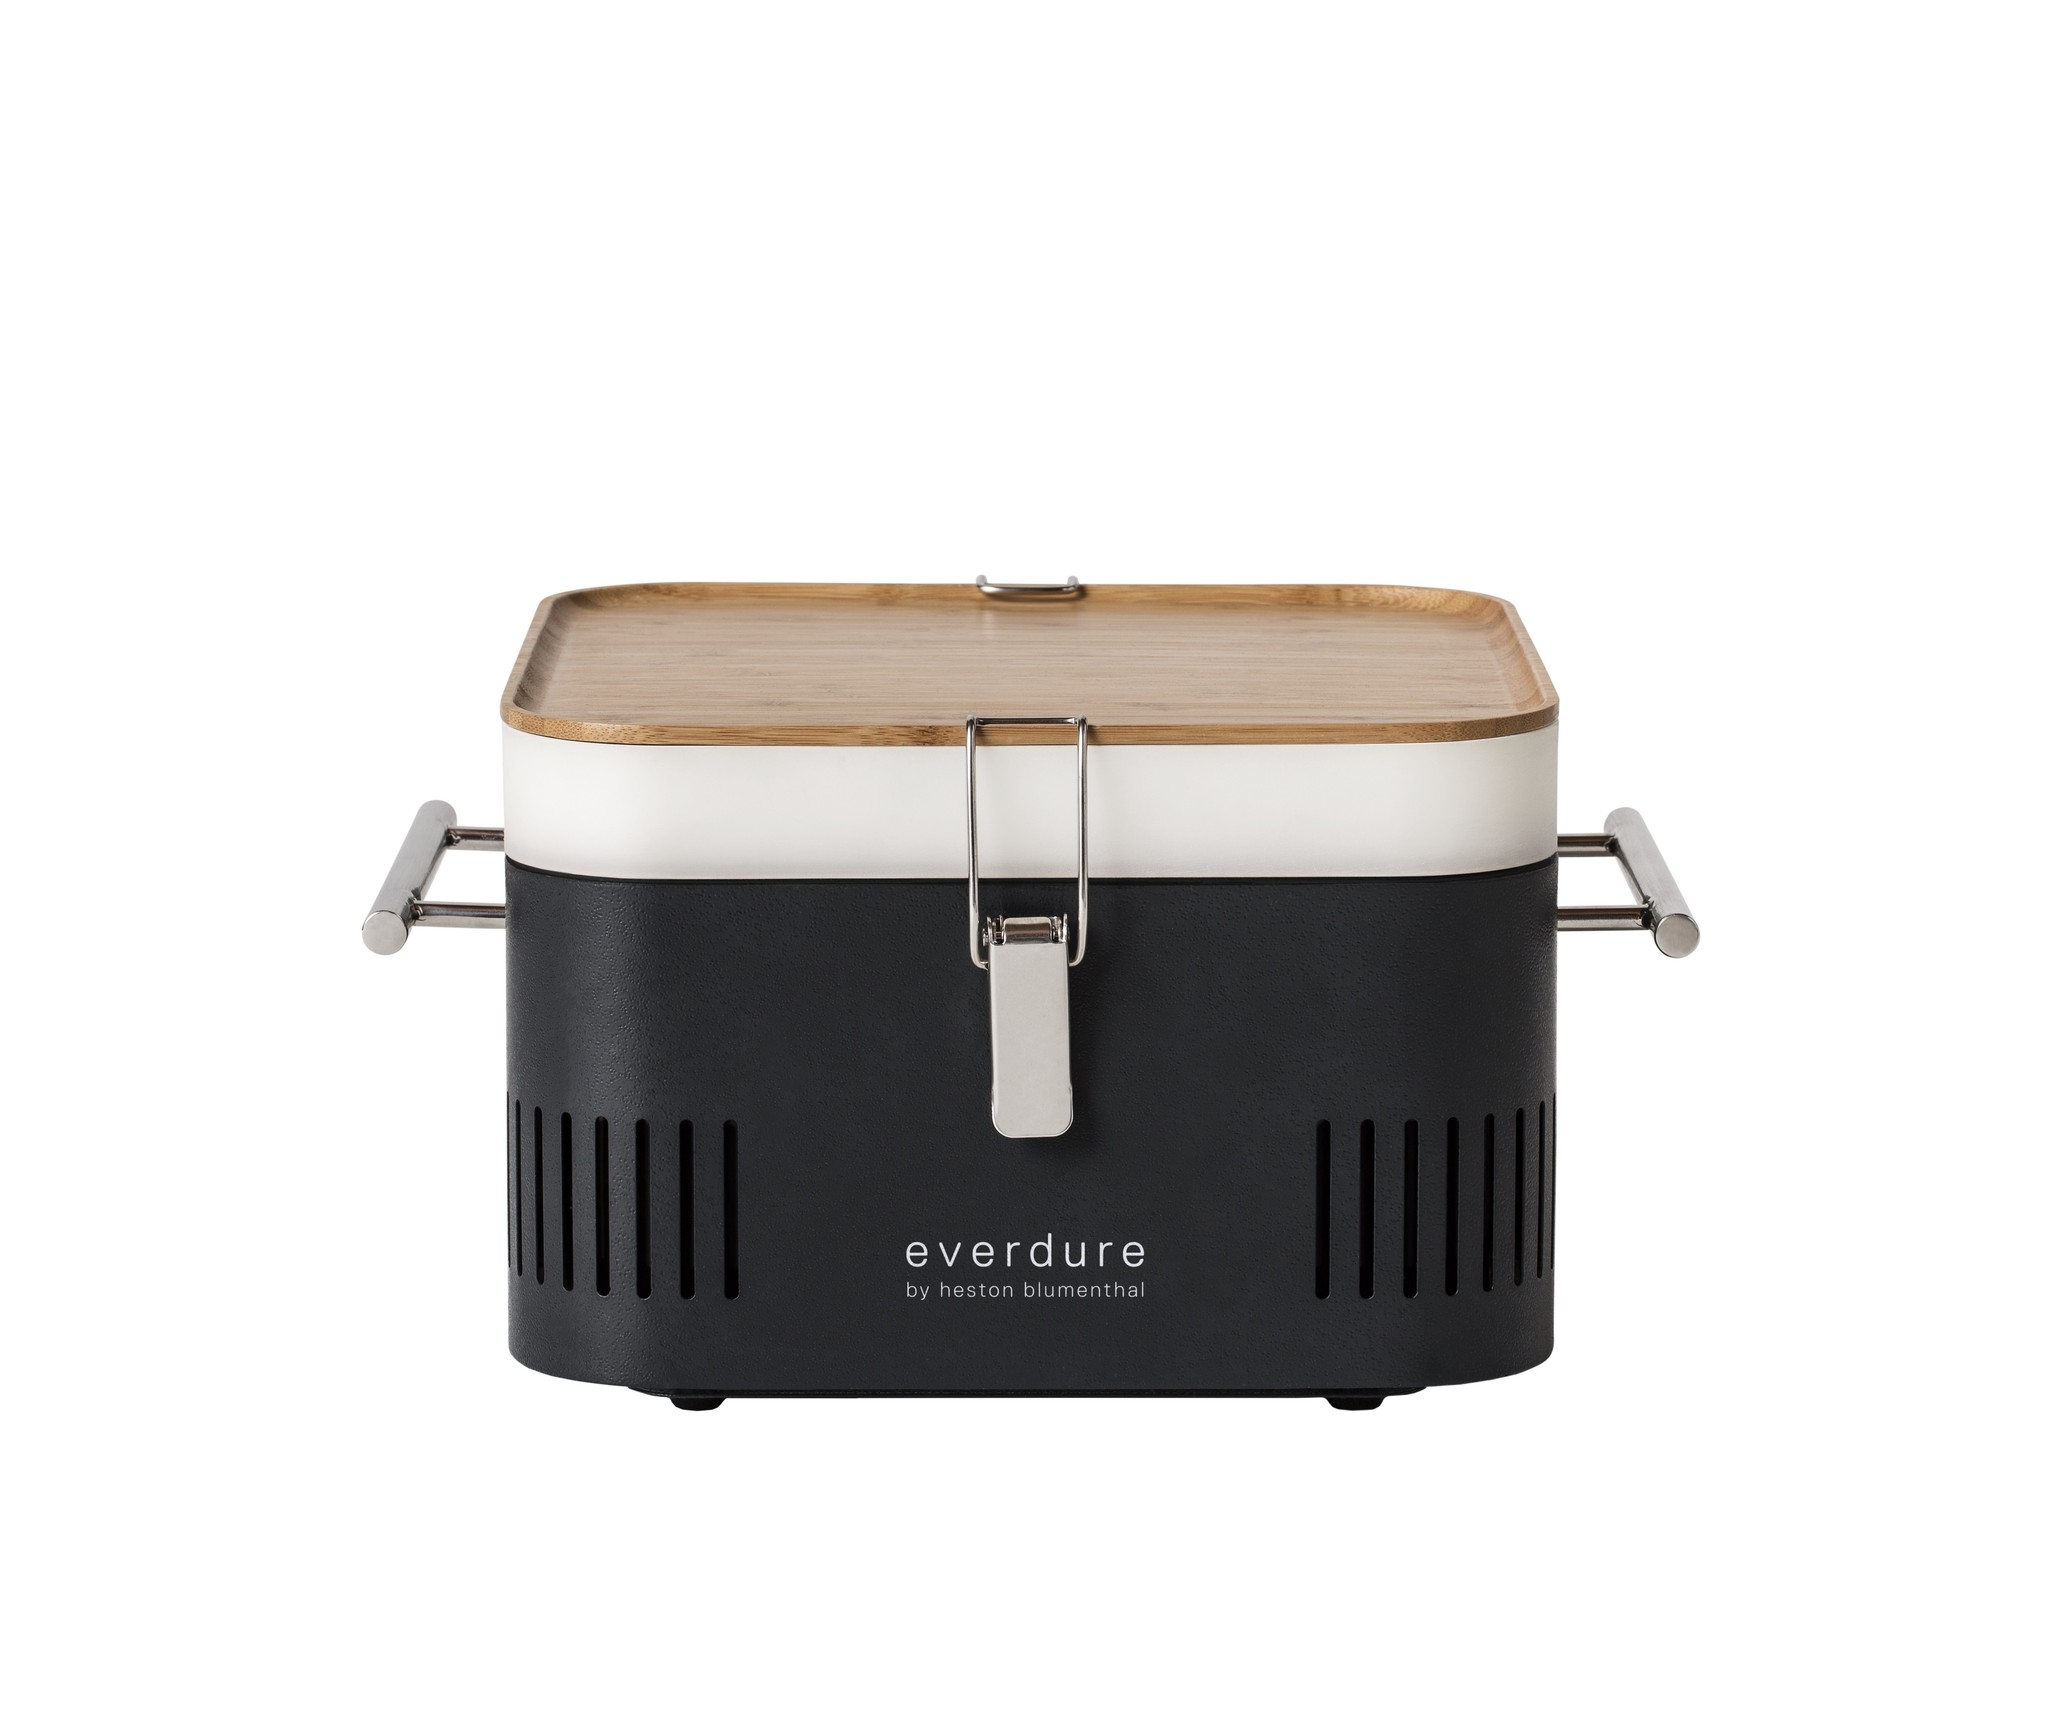 Everdure Cube zwart houtskoolbarbecue